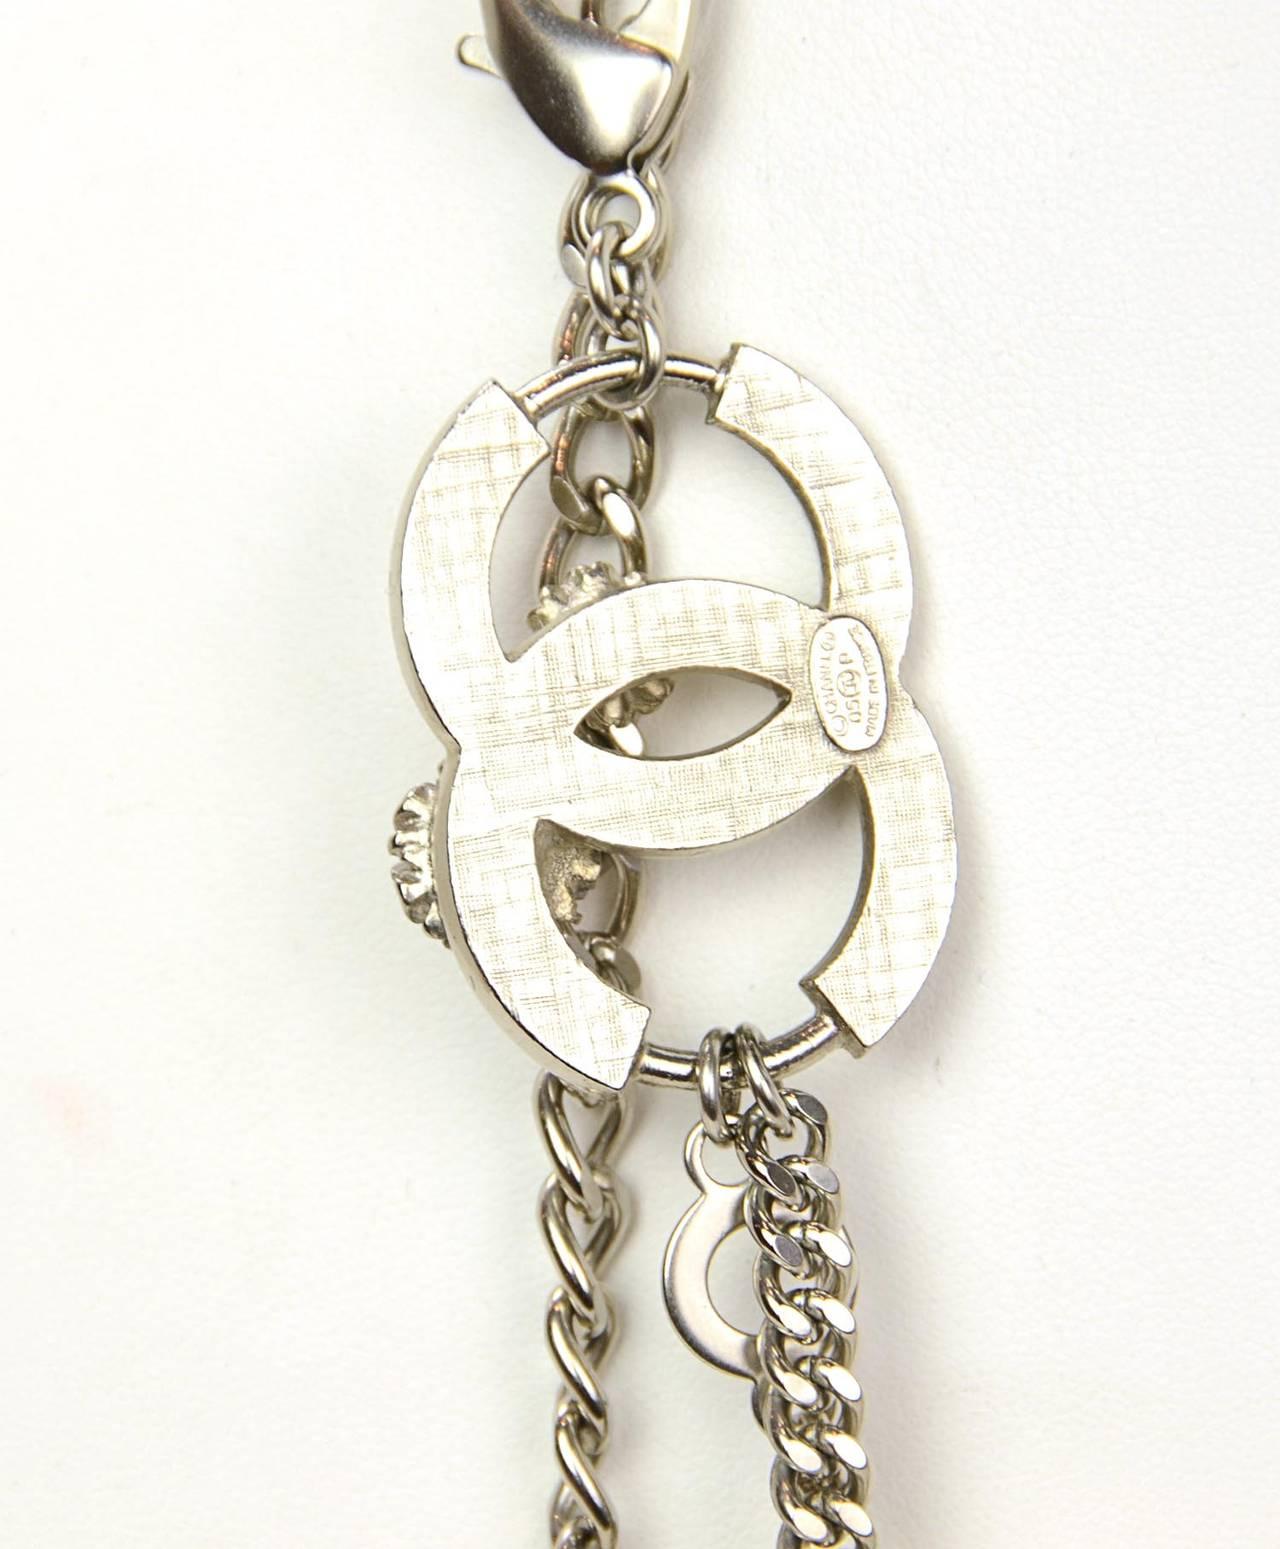 Chanel 2005 Silver Chain Link Belt/Necklace w/Flower & CC Pendants 5